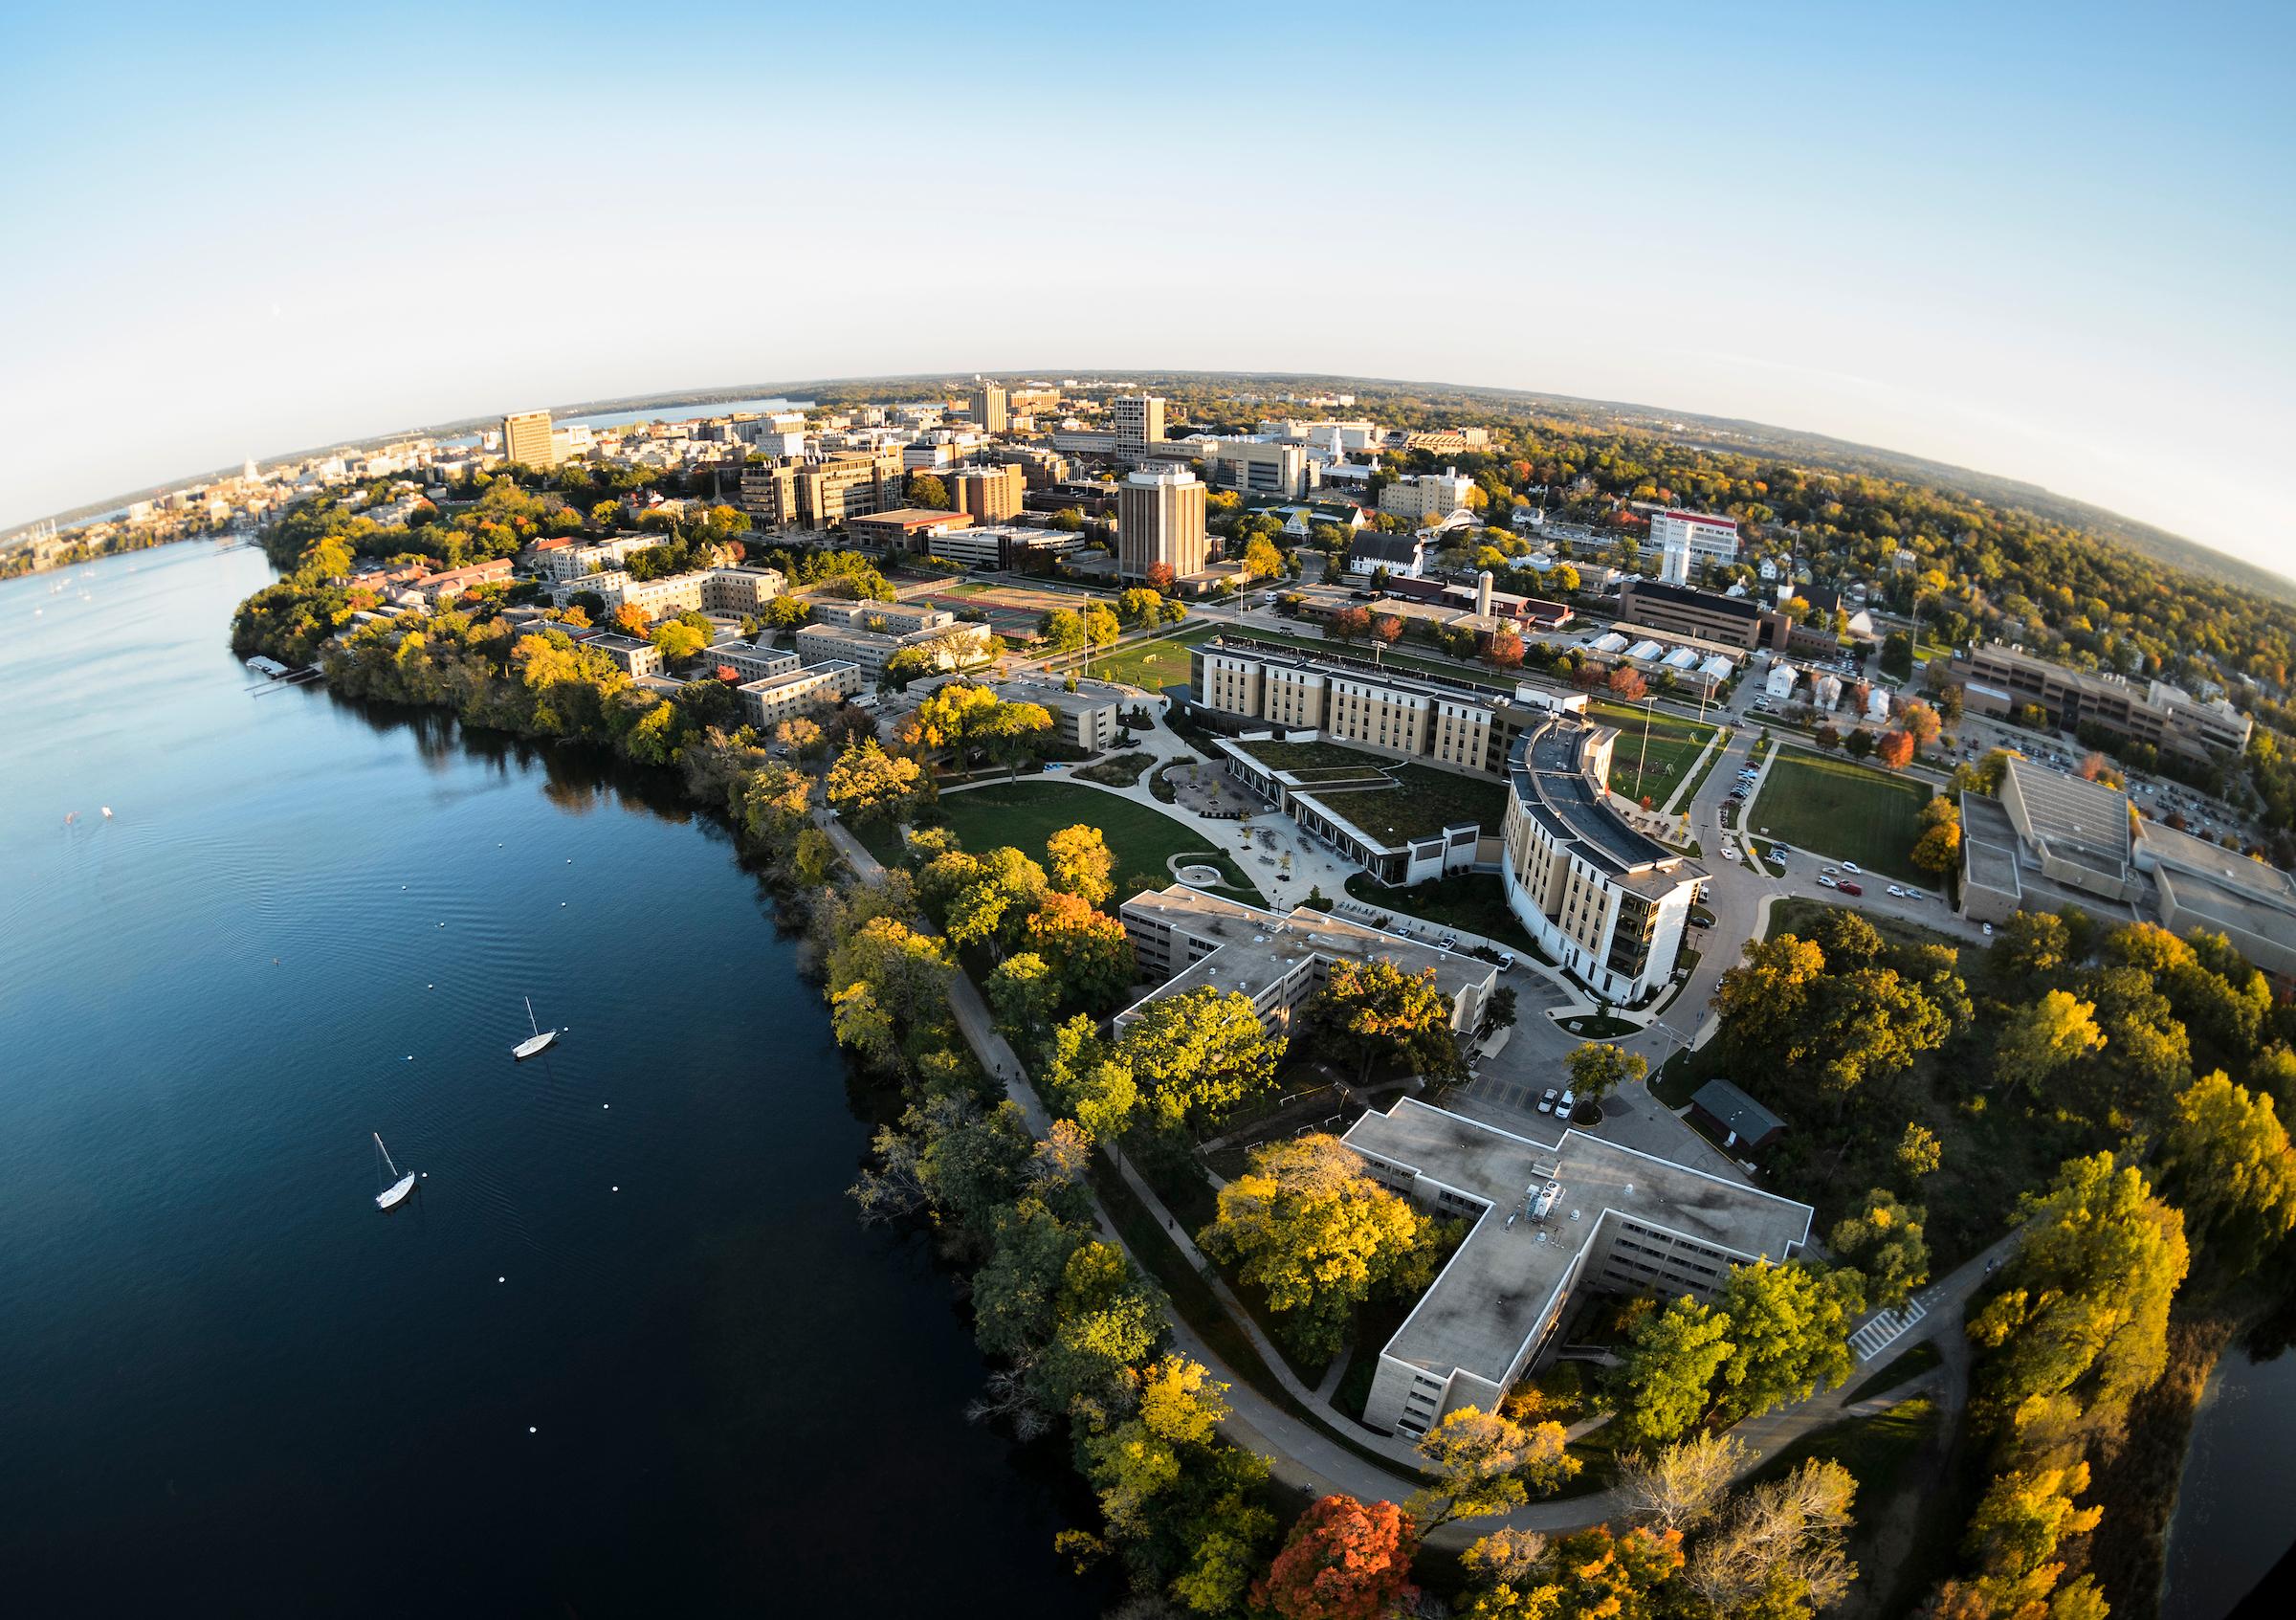 Aerial photograph of the UW–Madison campus and Lake Mendota